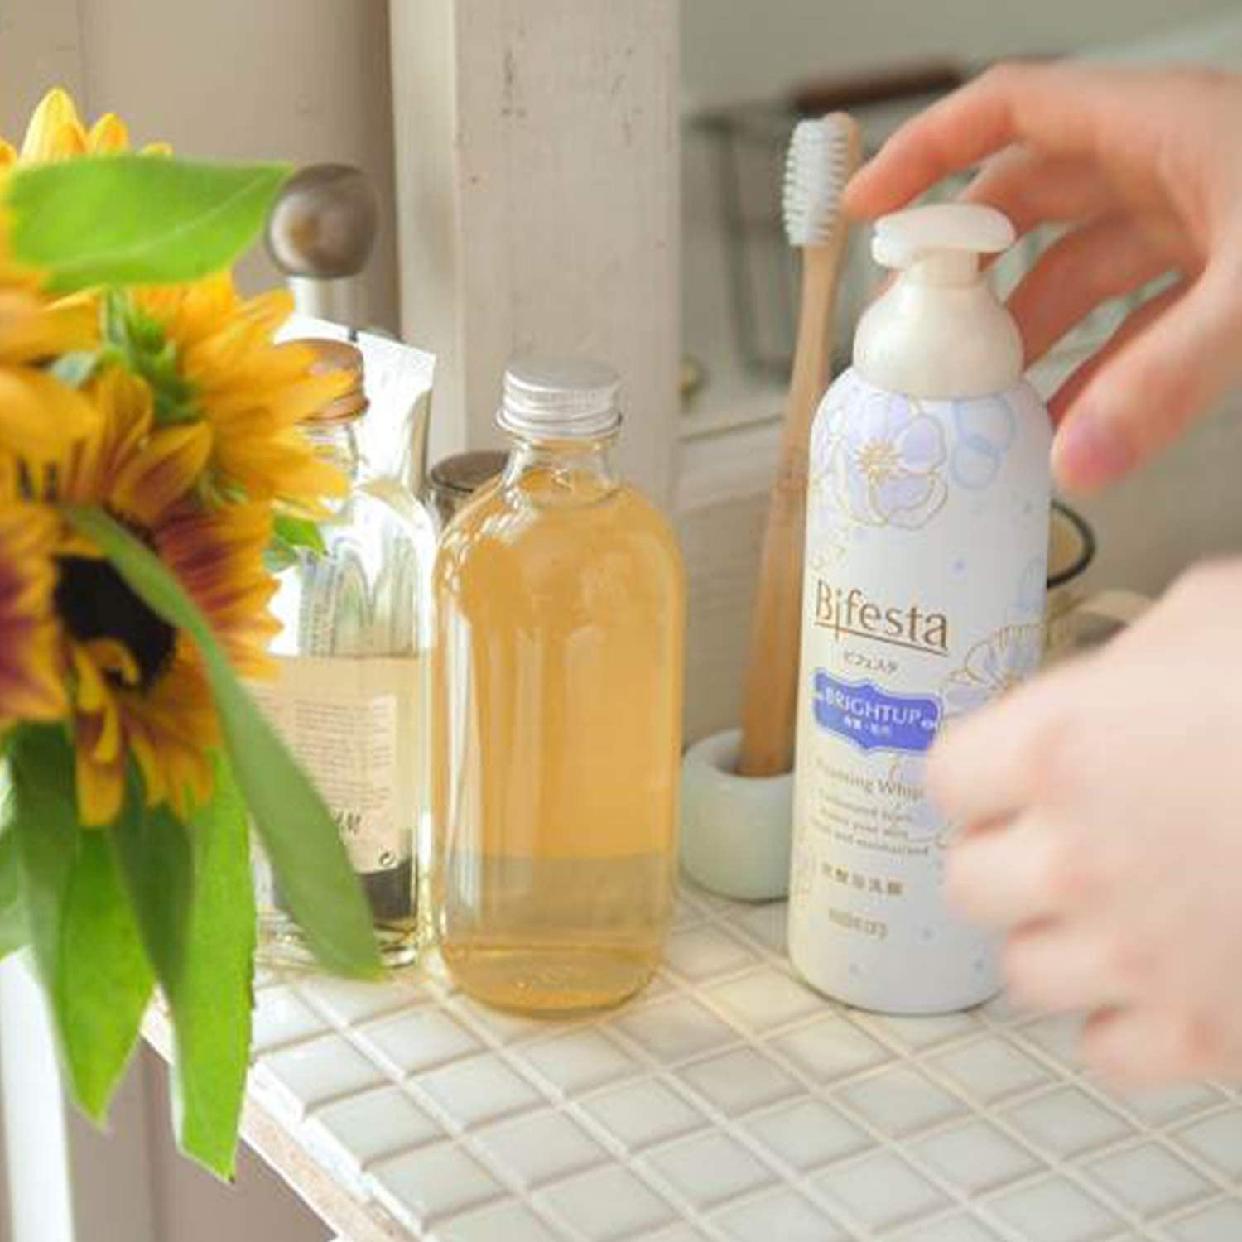 Bifesta(ビフェスタ) 泡洗顔 ブライトアップの商品画像11